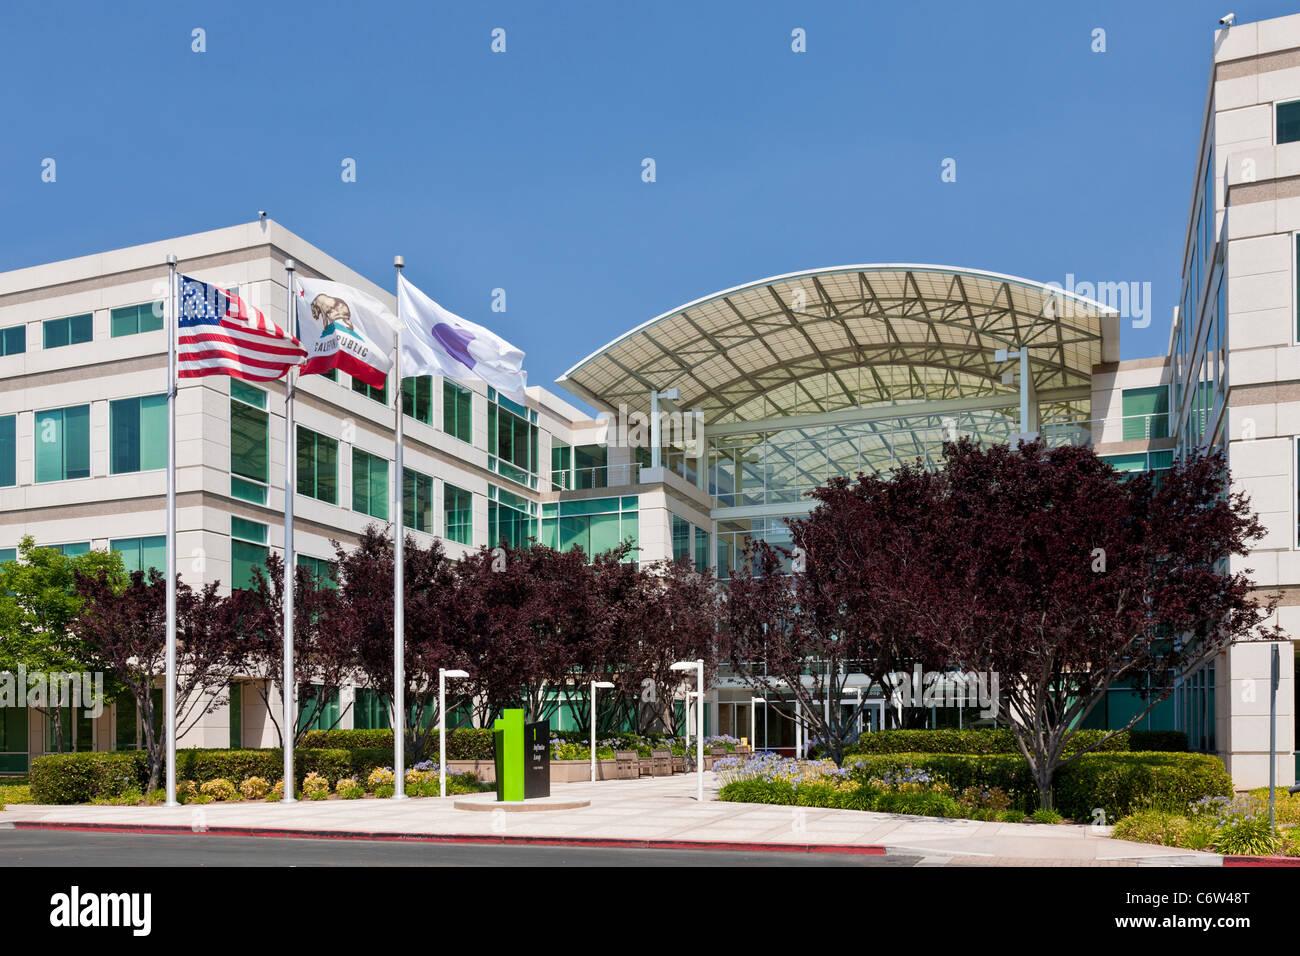 Apple Incorporated's corporate headquarters at 1-6 Infinite Loop, Cupertino, California, USA. JMH5187 Stock Photo